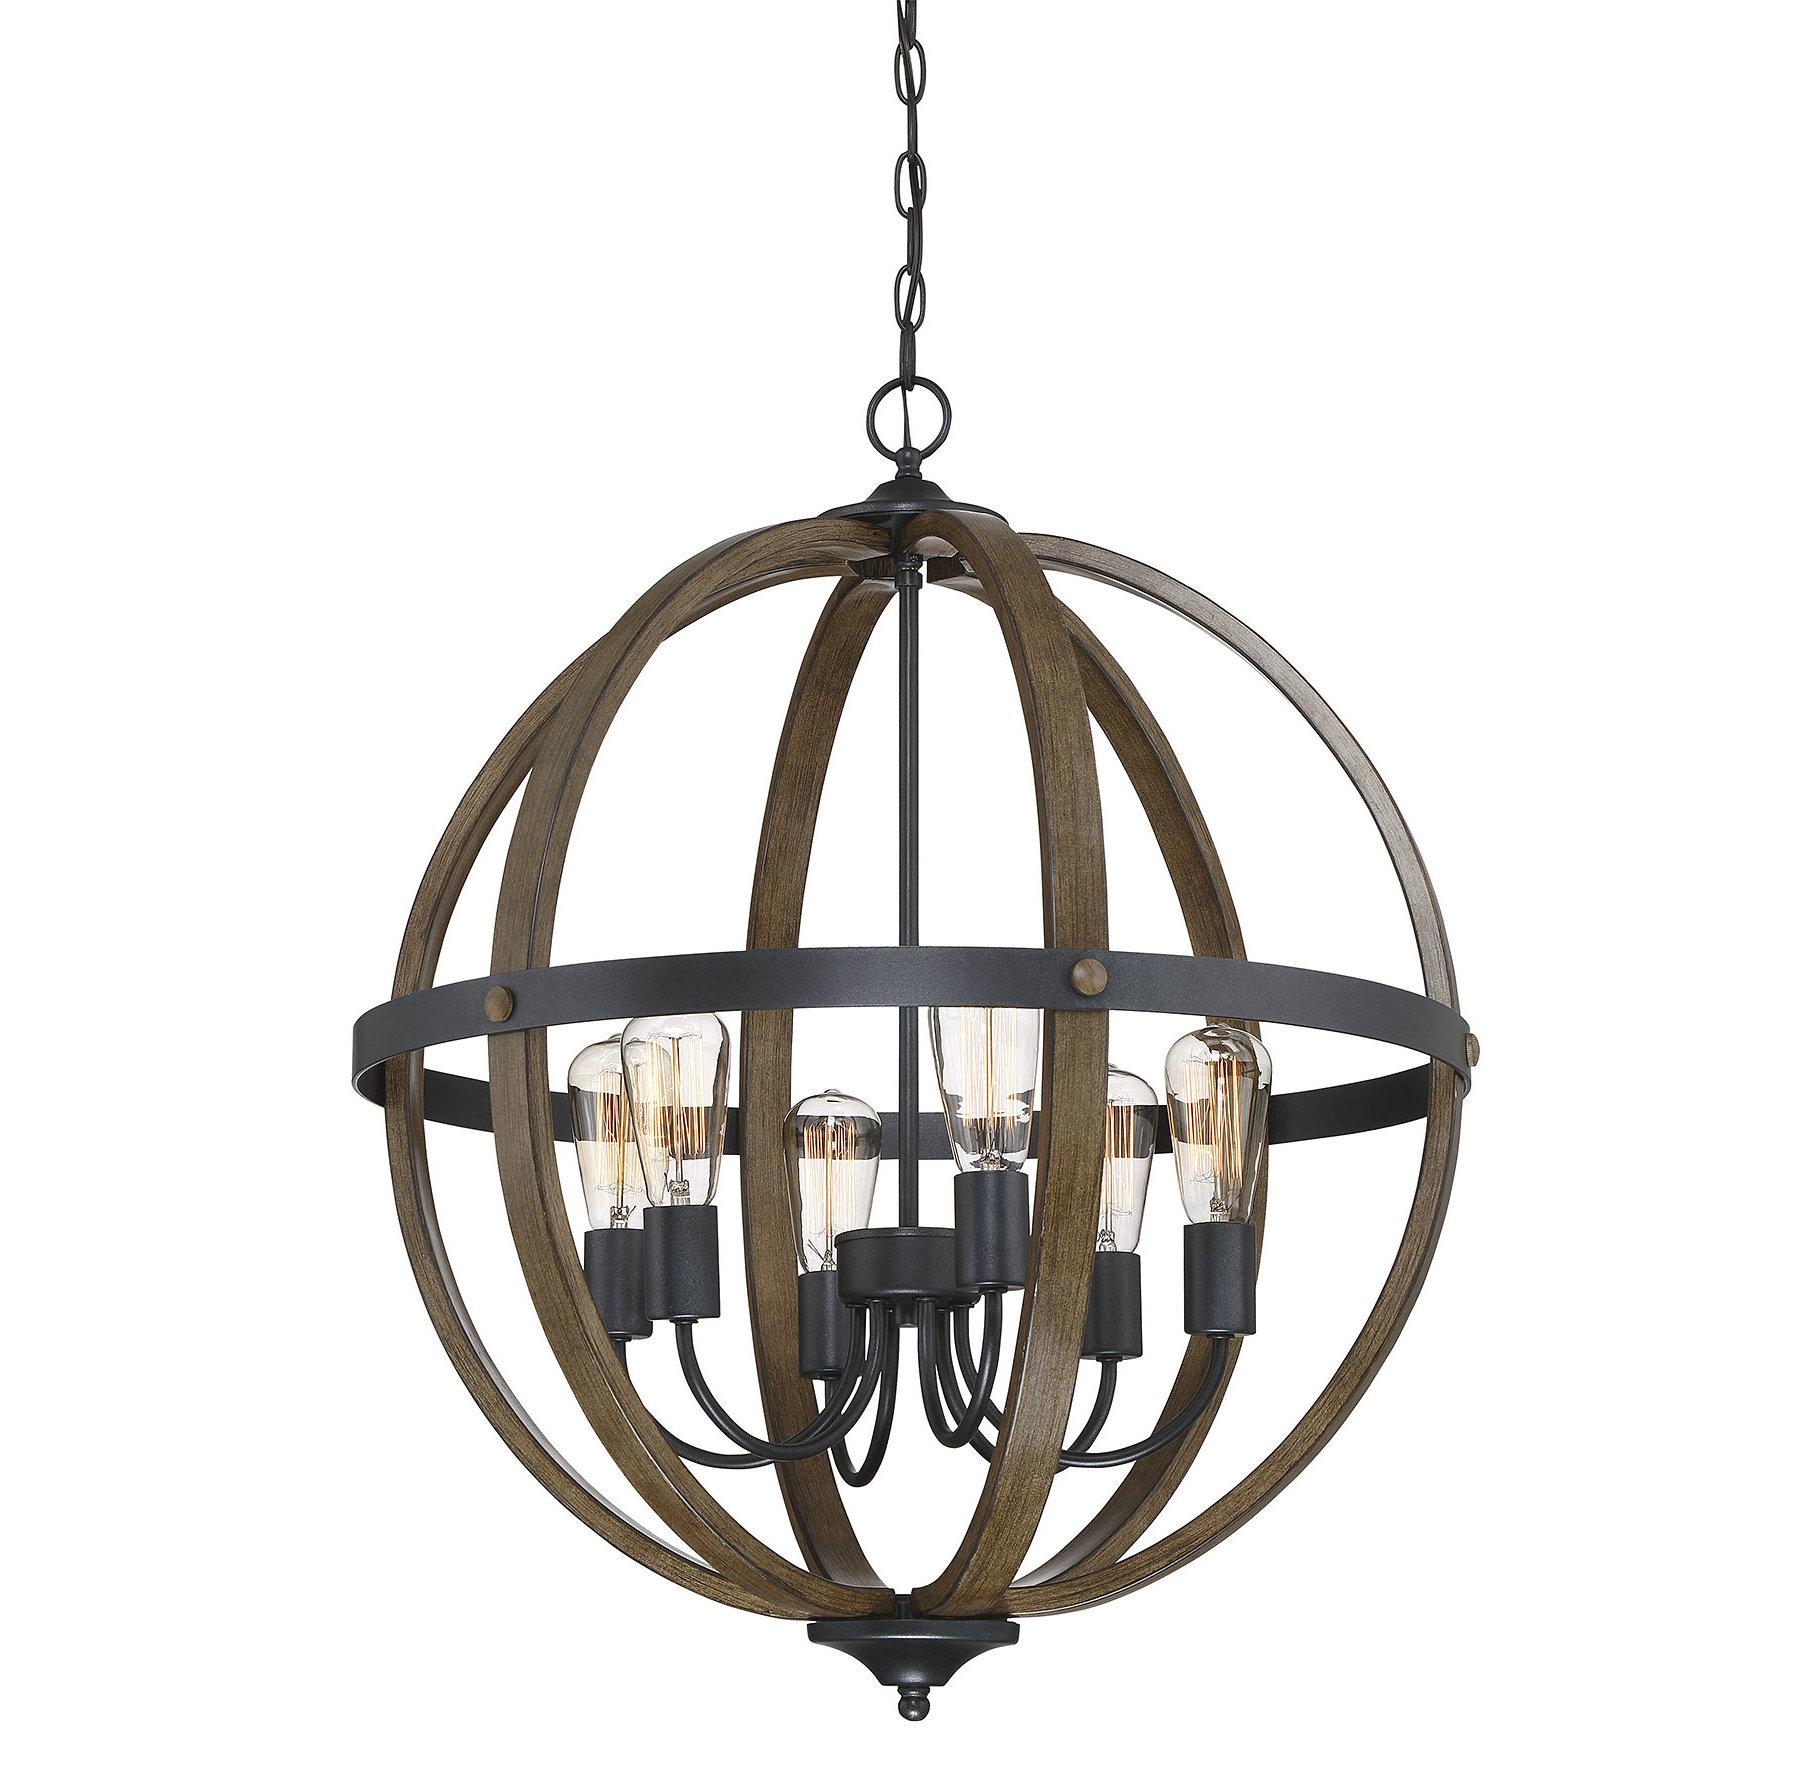 Farmhouse & Rustic Globe Chandeliers | Birch Lane For Hendry 4 Light Globe Chandeliers (View 24 of 30)